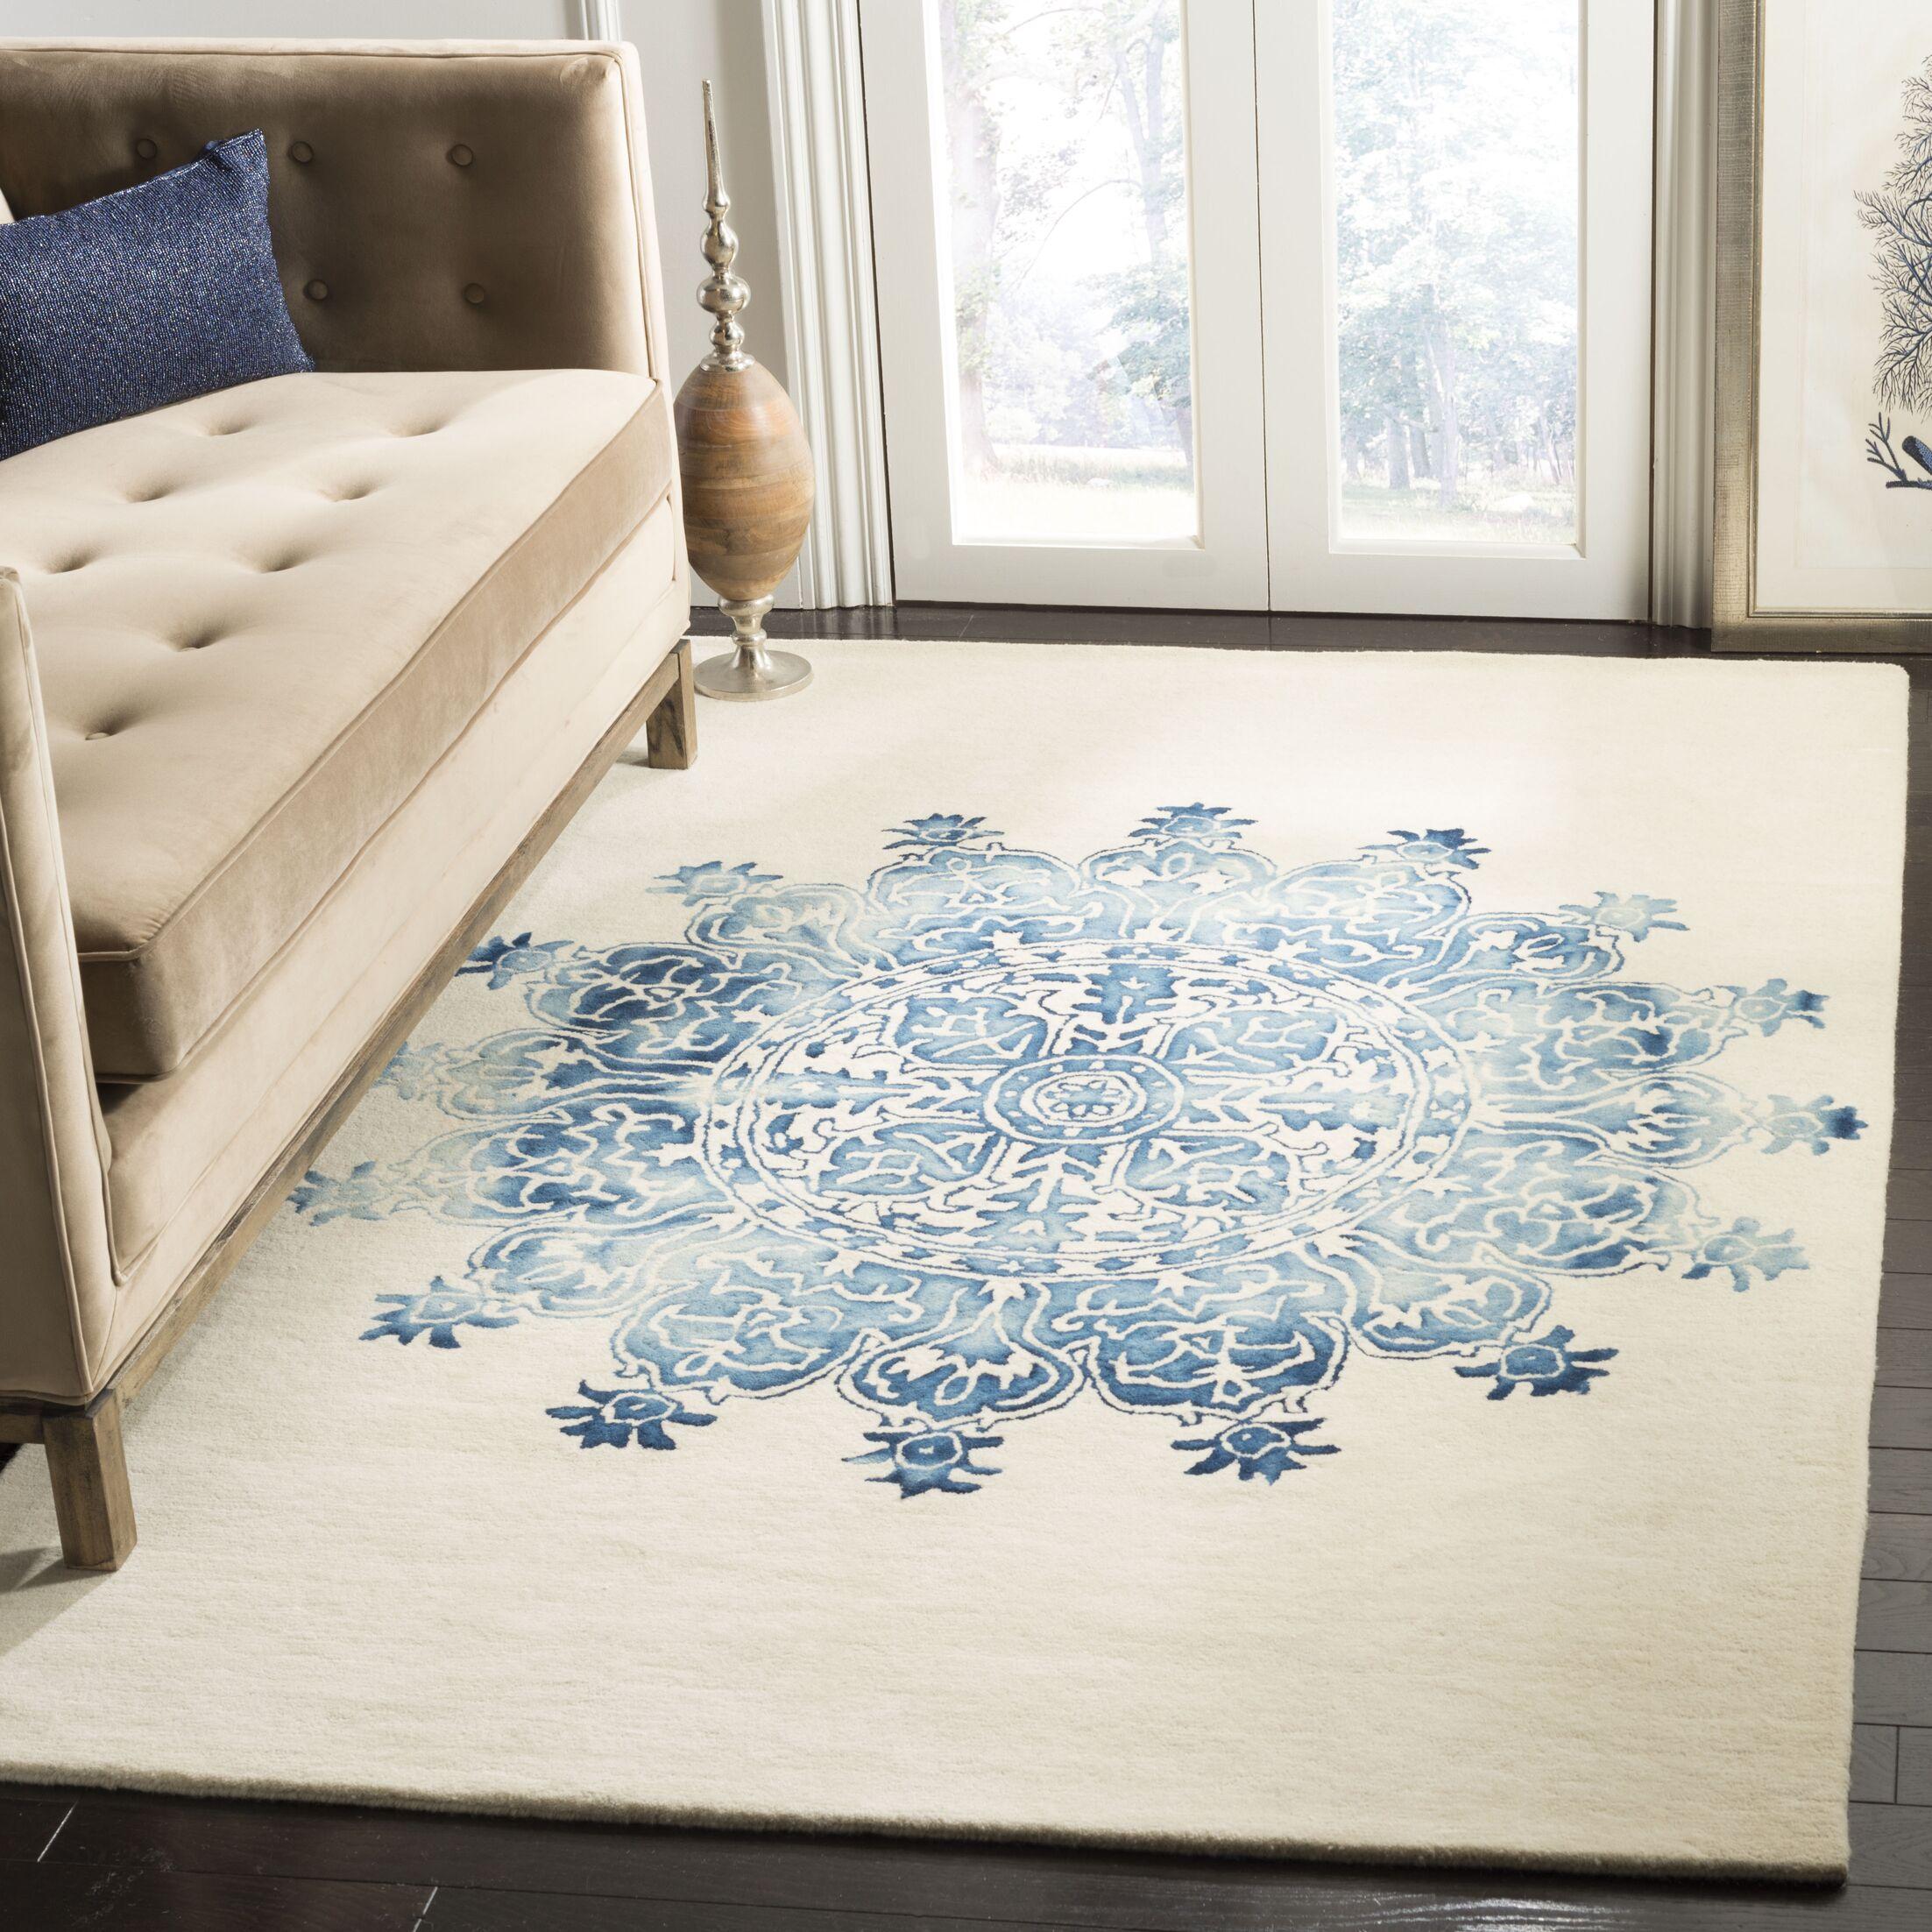 Katz Hand-Tufted Wool Blue/Beige Area Rug Rug Size: Square 7'